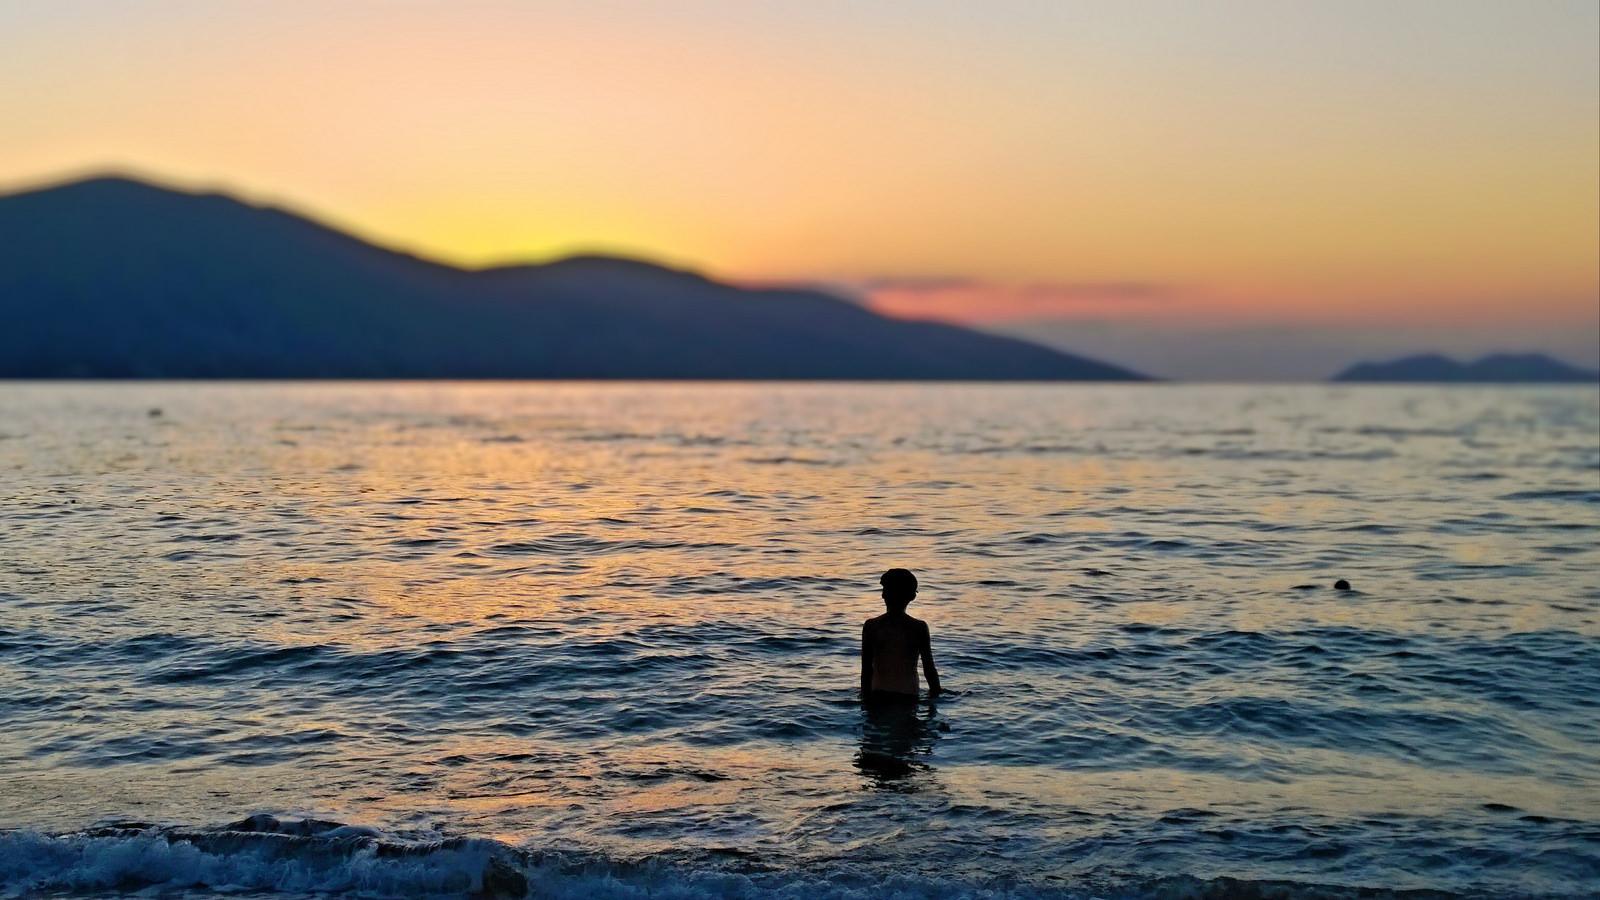 Exploring the Adriatic coast flickr image by Sarah Tzineris